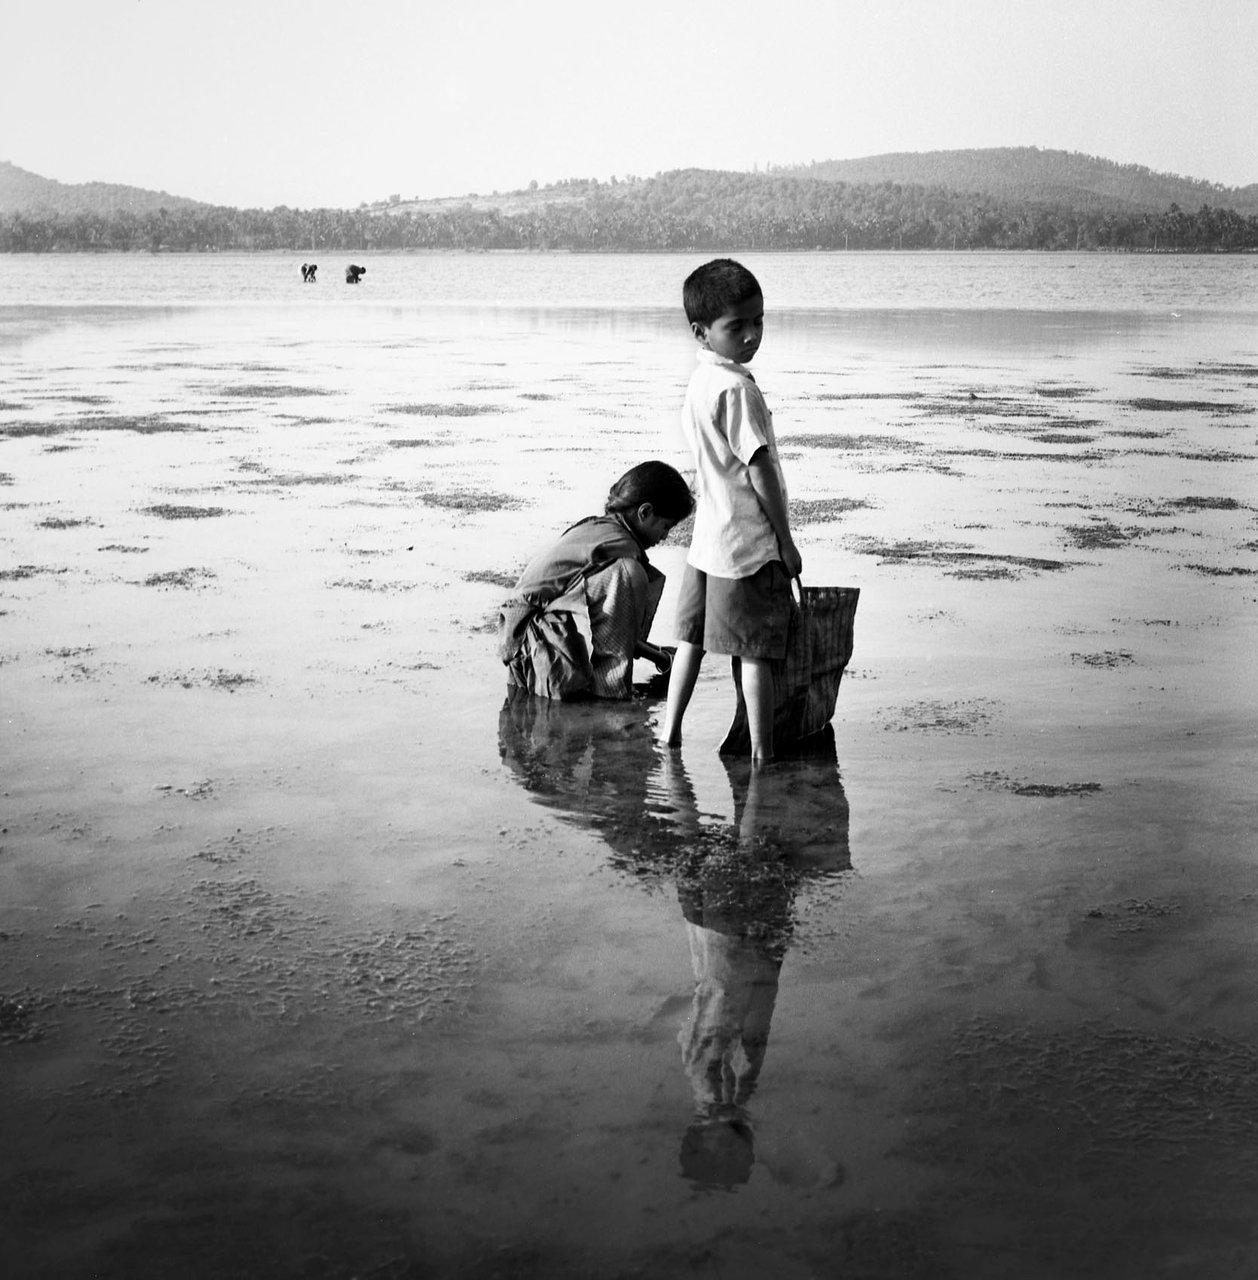 Walking on water, Gokarna